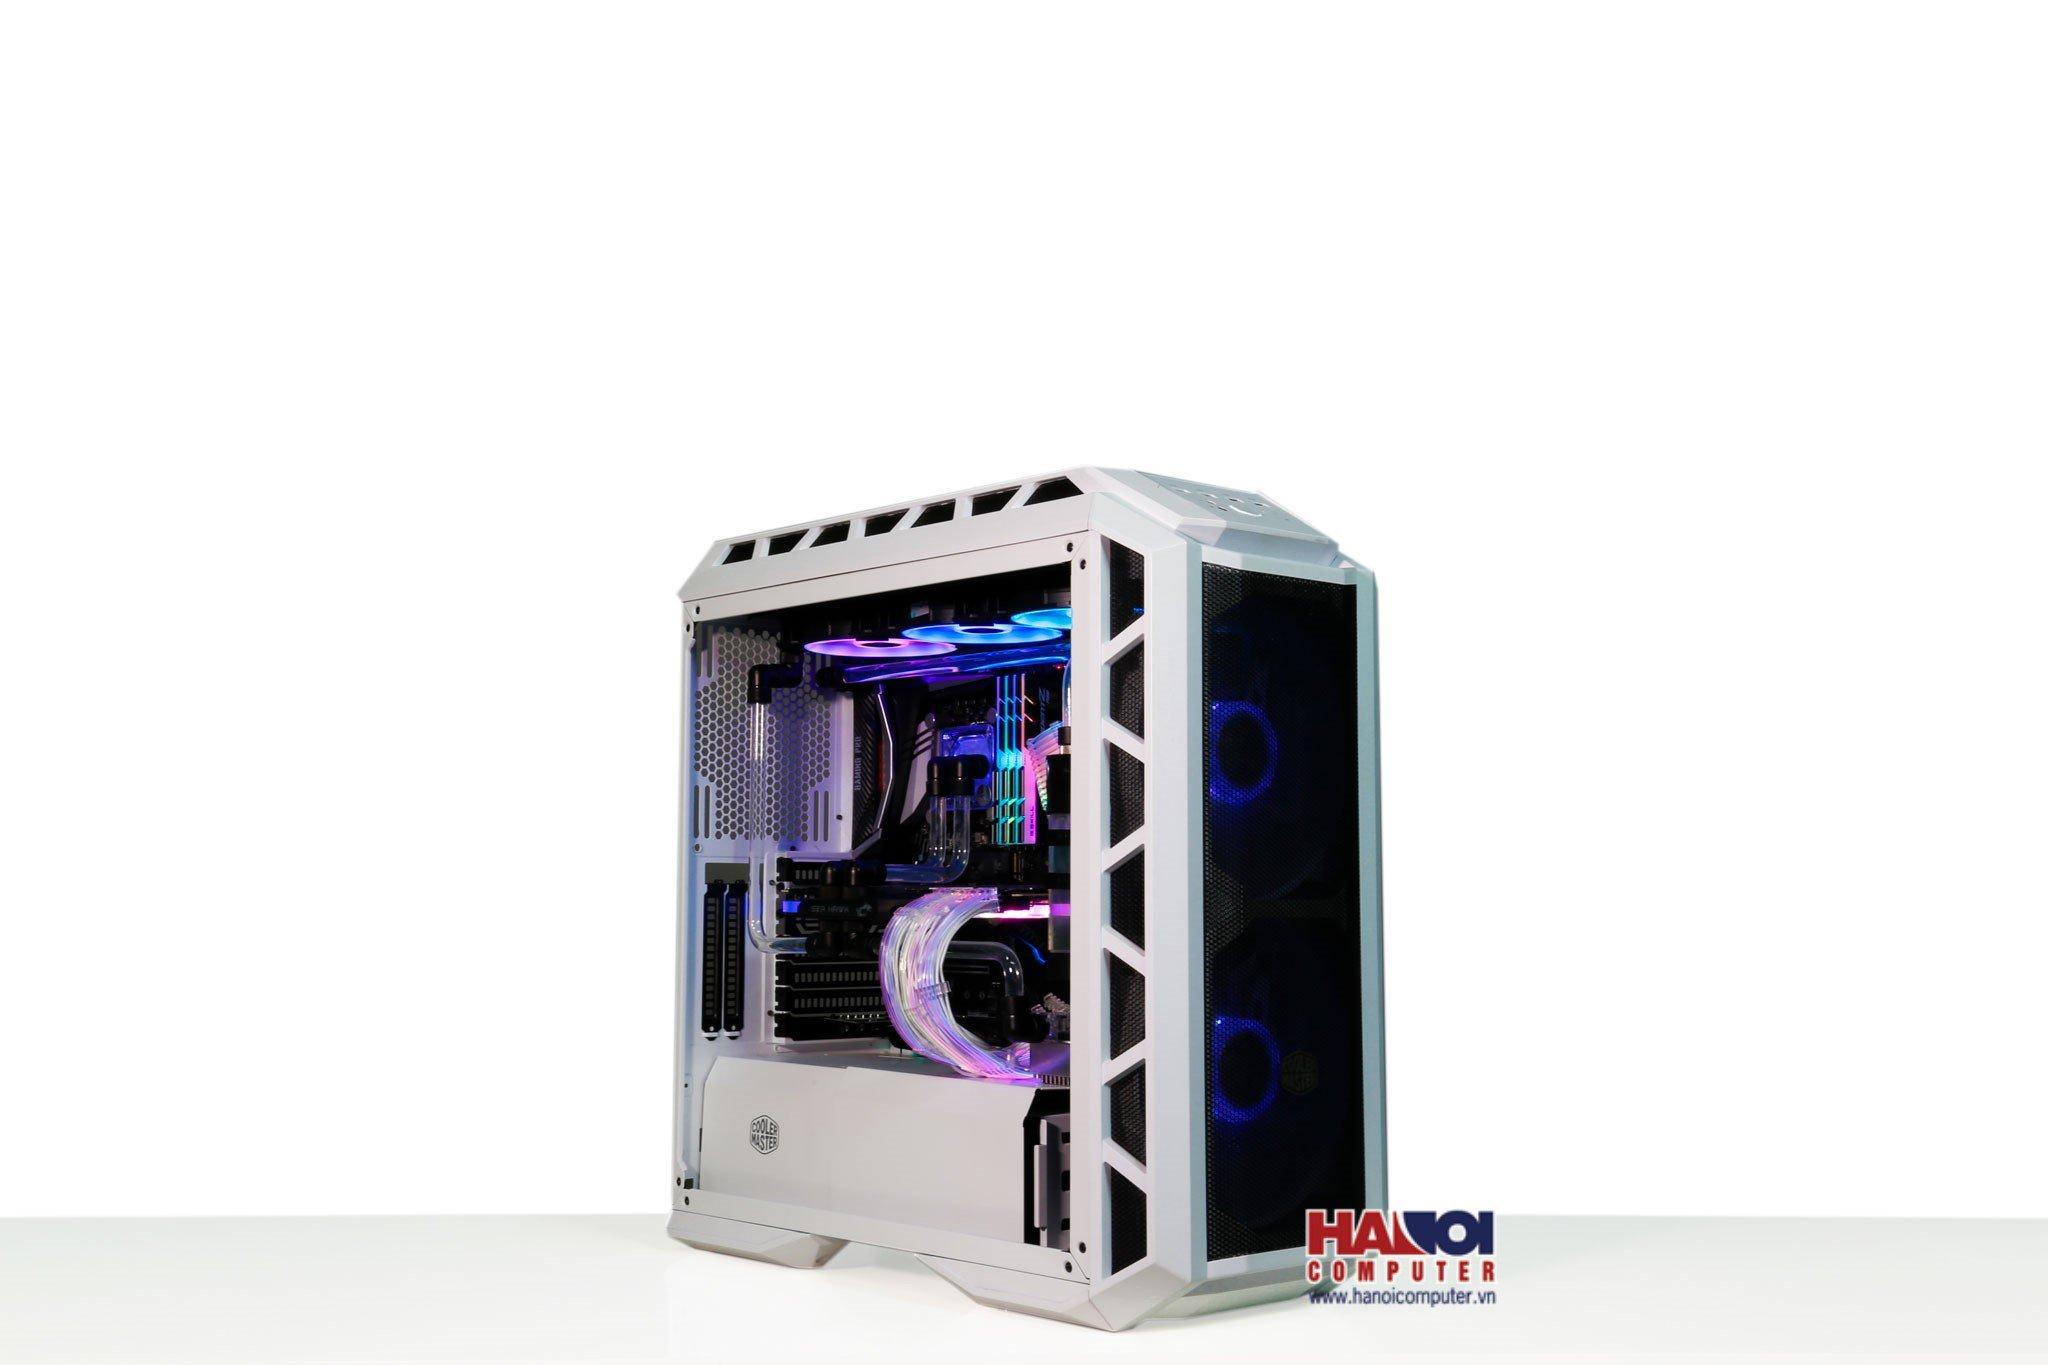 Modding PC CoolerMaster H500P White Mesh HT-43 TRINITY